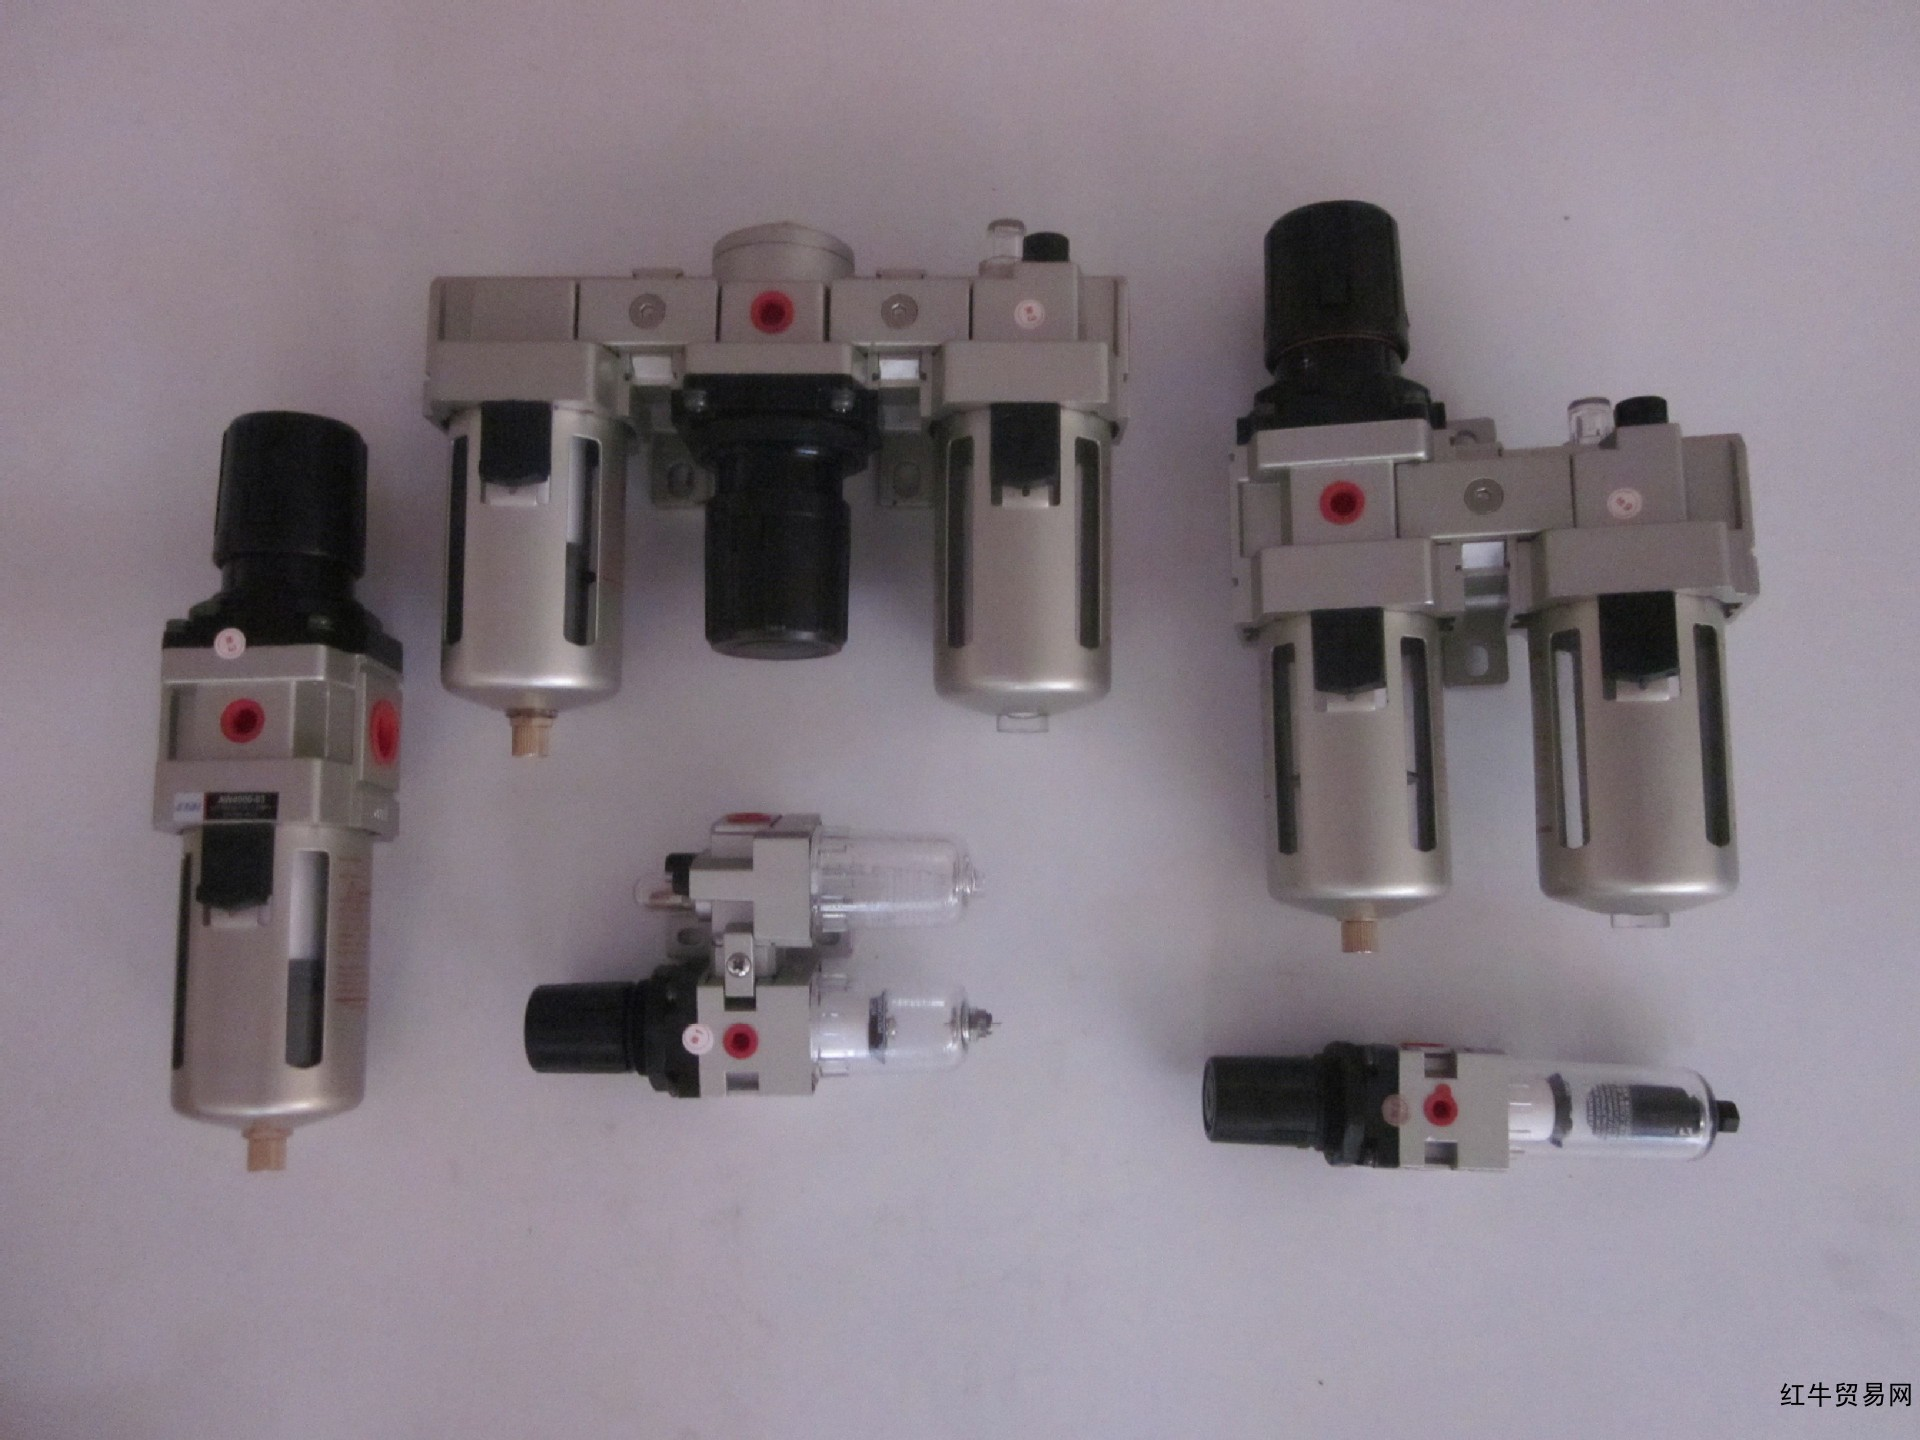 (original SEJ.SED ANPASSUNG DER zylinder SE32X75-S/SE32X100-S-FA.CB.TC.Y de gast)